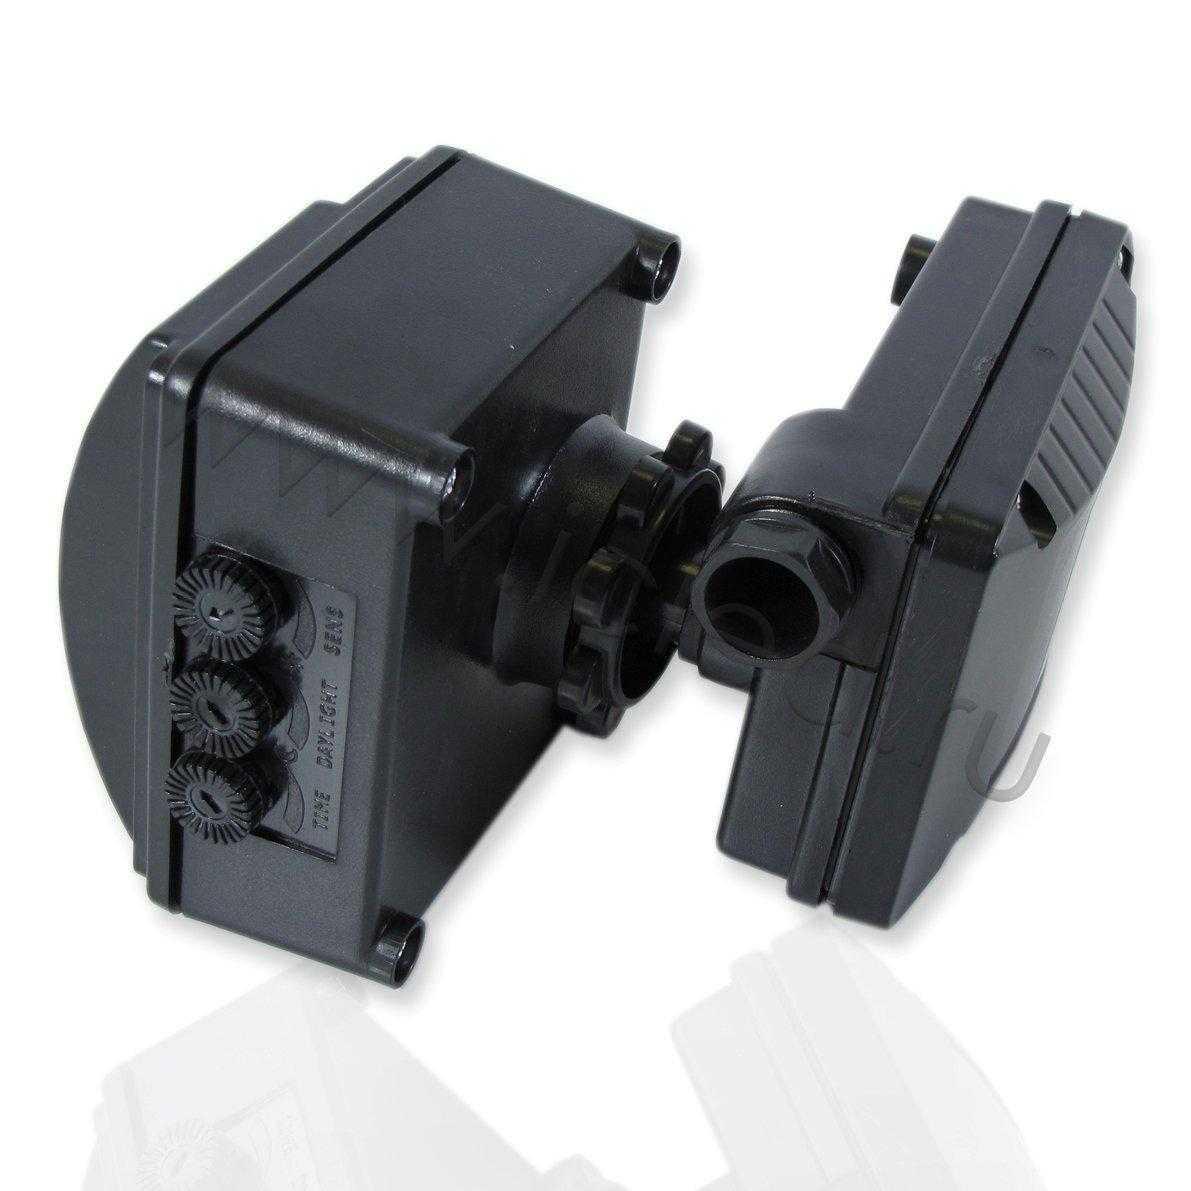 Датчик движения LX 01 Black